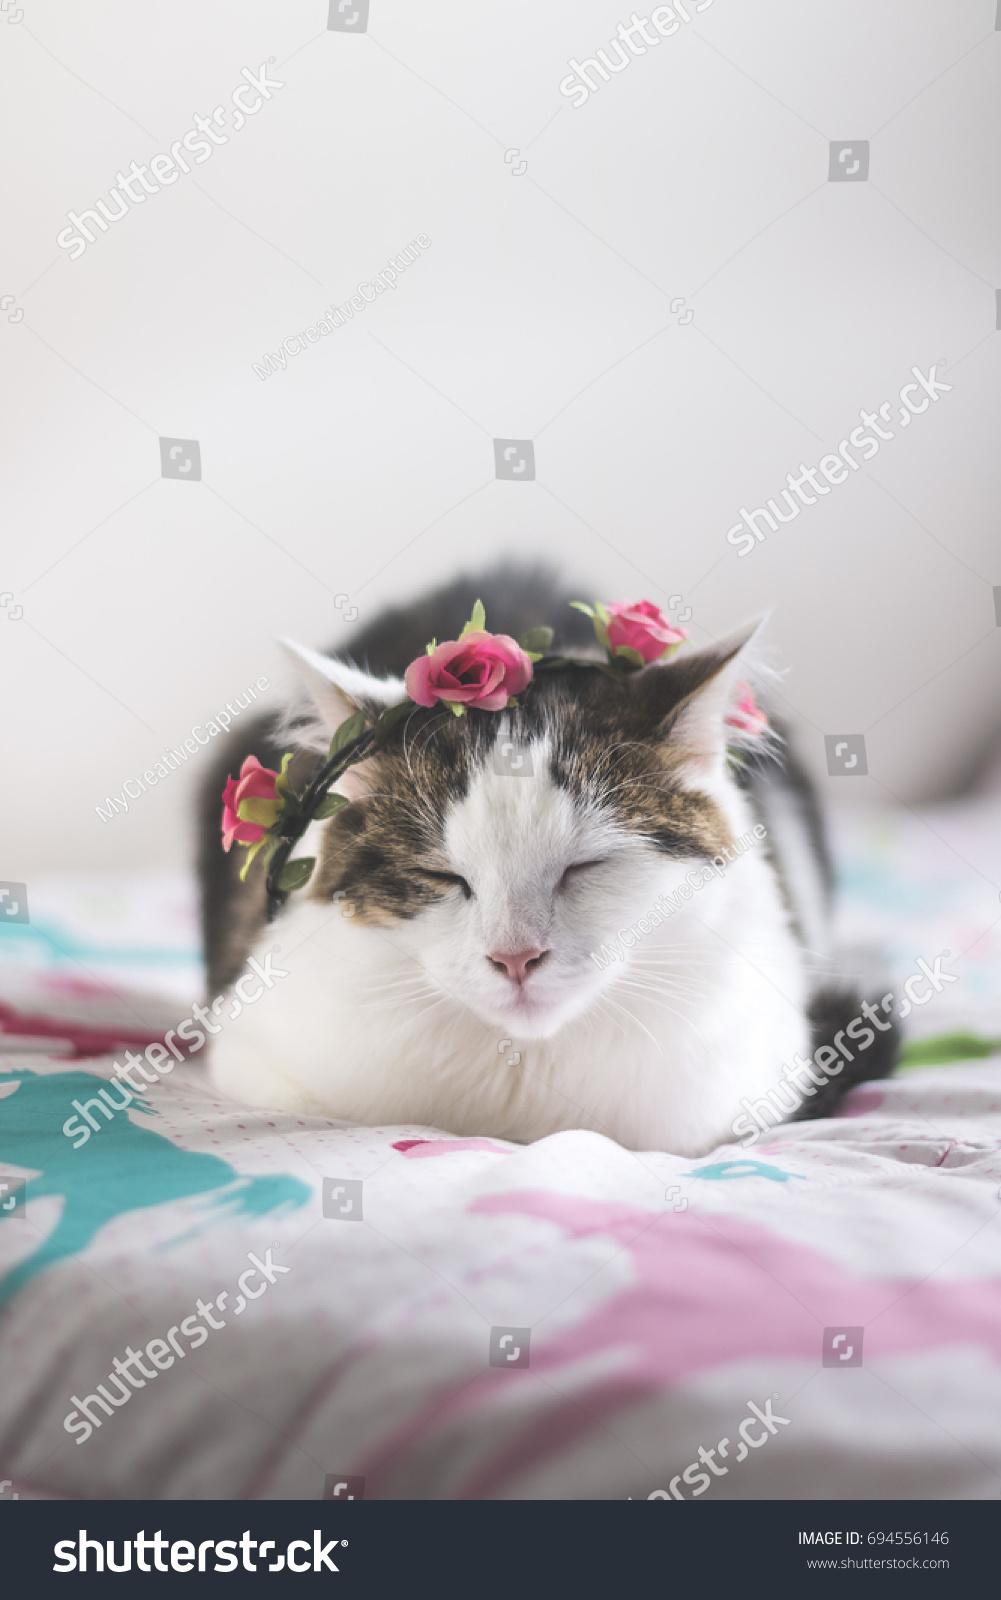 Sleeping Cat Wearing Flowercrown Stock Photo Edit Now 694556146